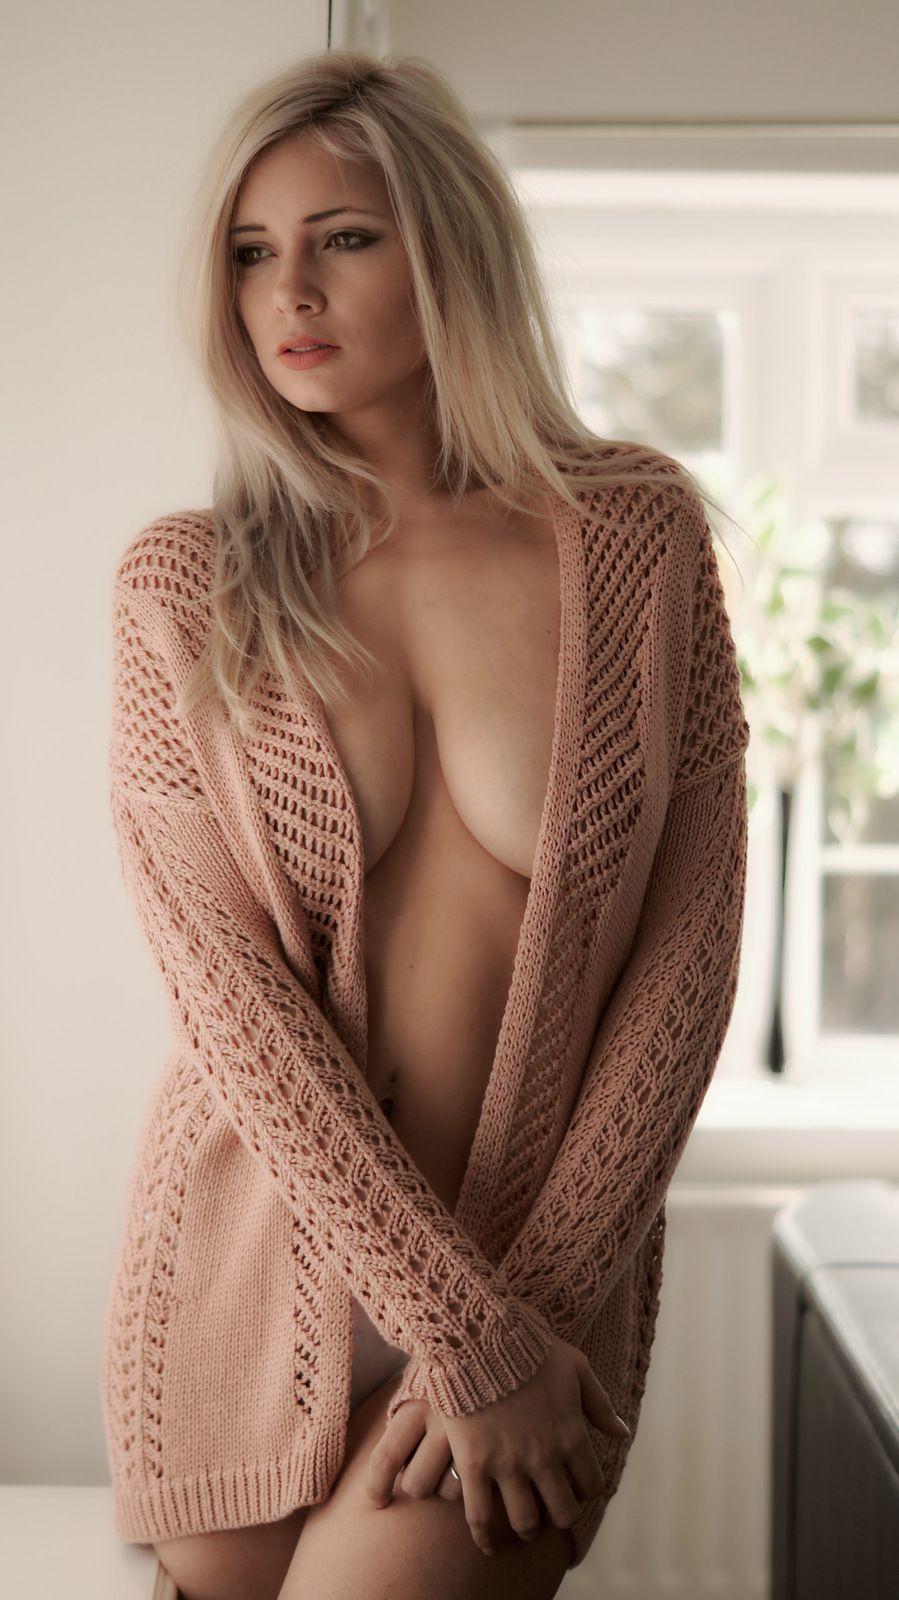 Milf wearing sweater nothing else